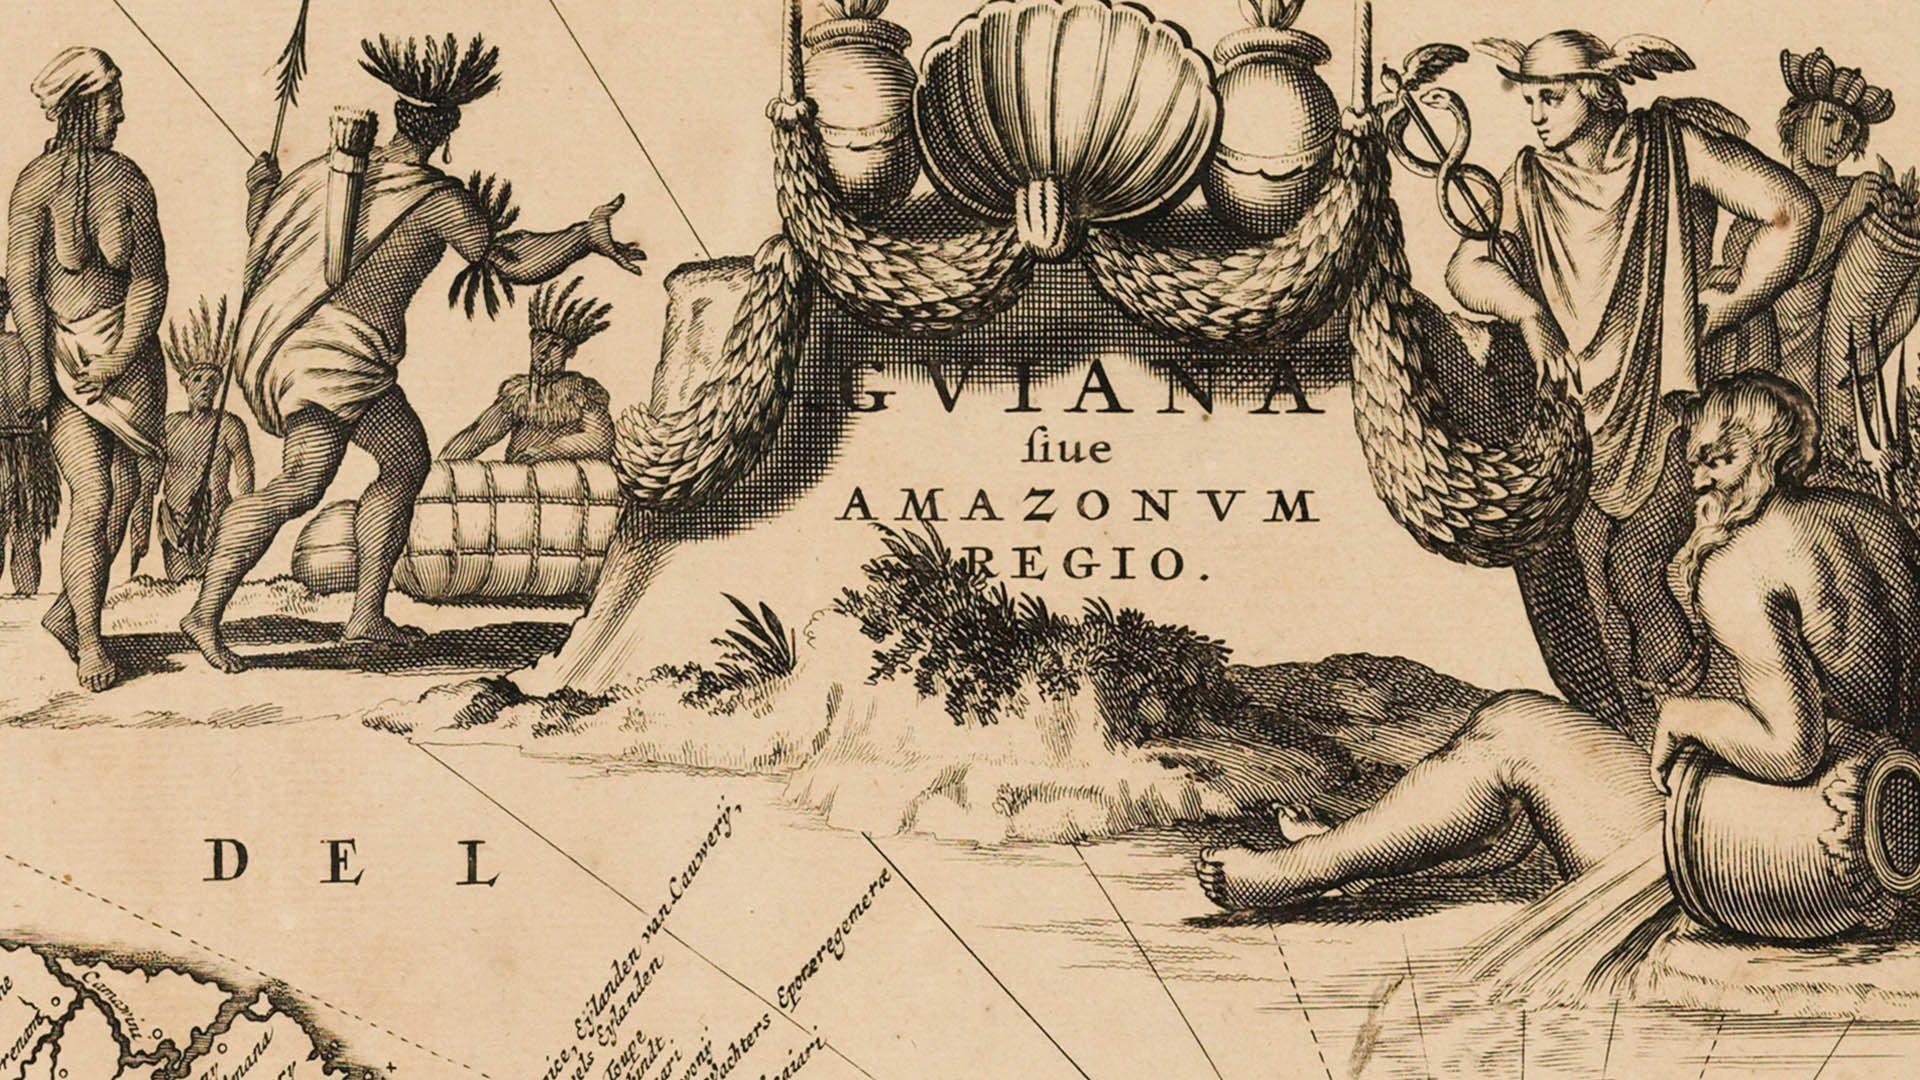 Detalhe de Guiana fiue Amazonum régio, c.1671, de John Ogilby, 1600-1676 (a partir de Arnoldus Montanus, 1625?-1683)